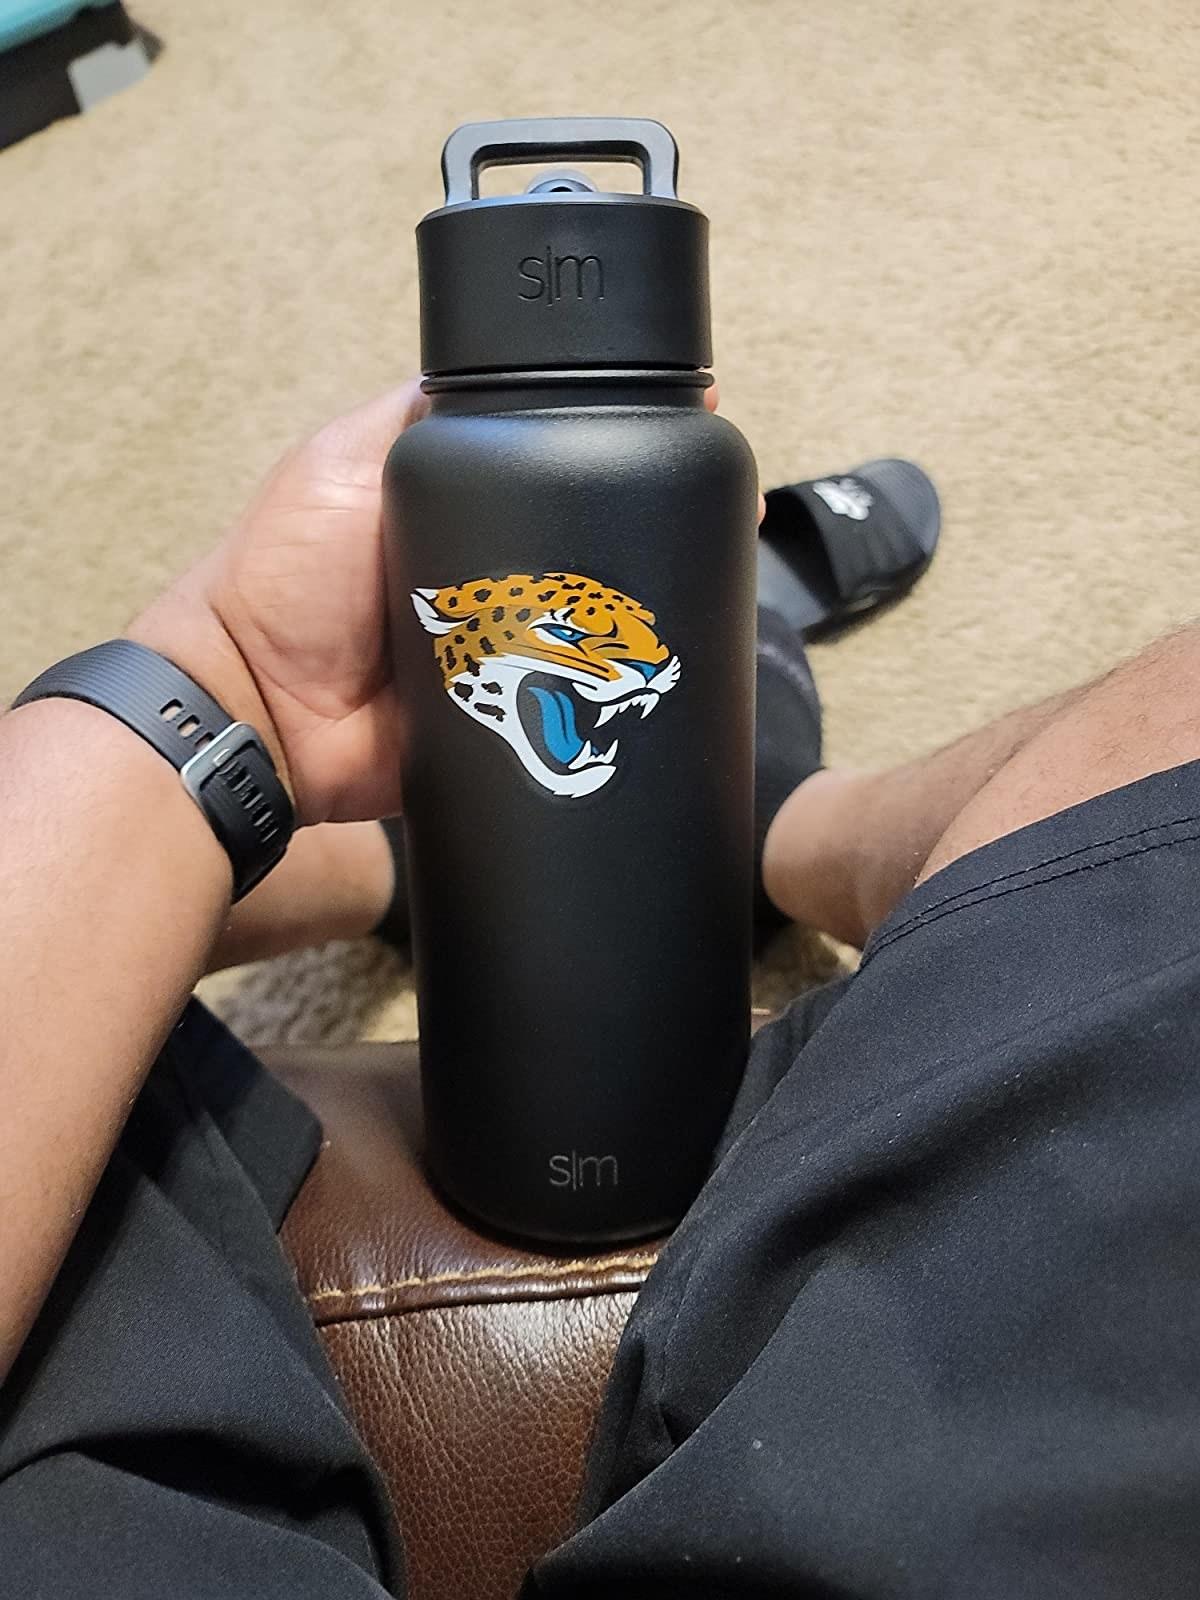 The bottle with a jaguar on it